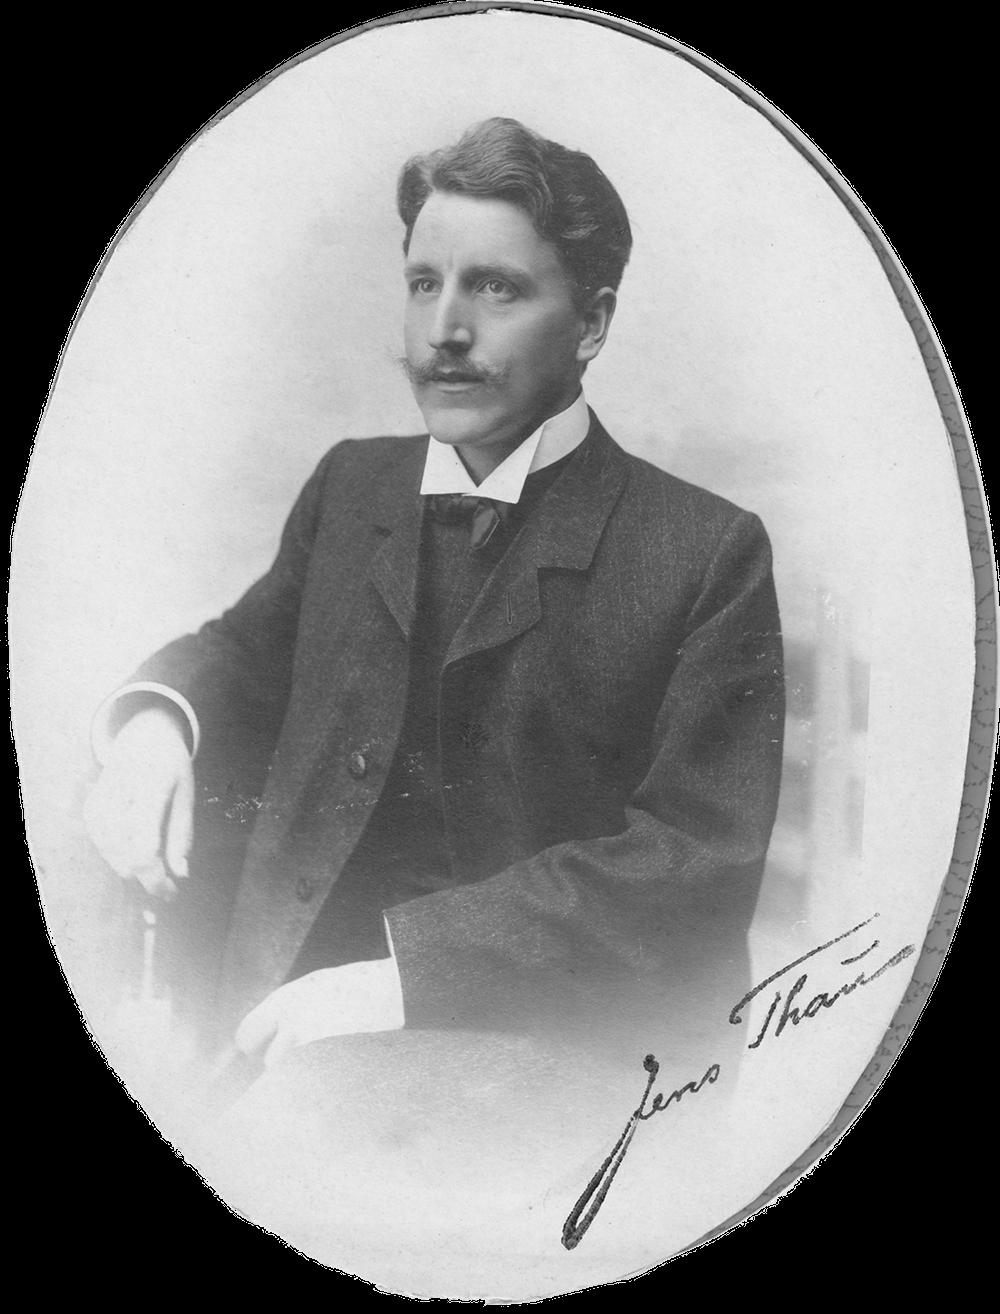 Jens Thau, portræt fra ca. 1910